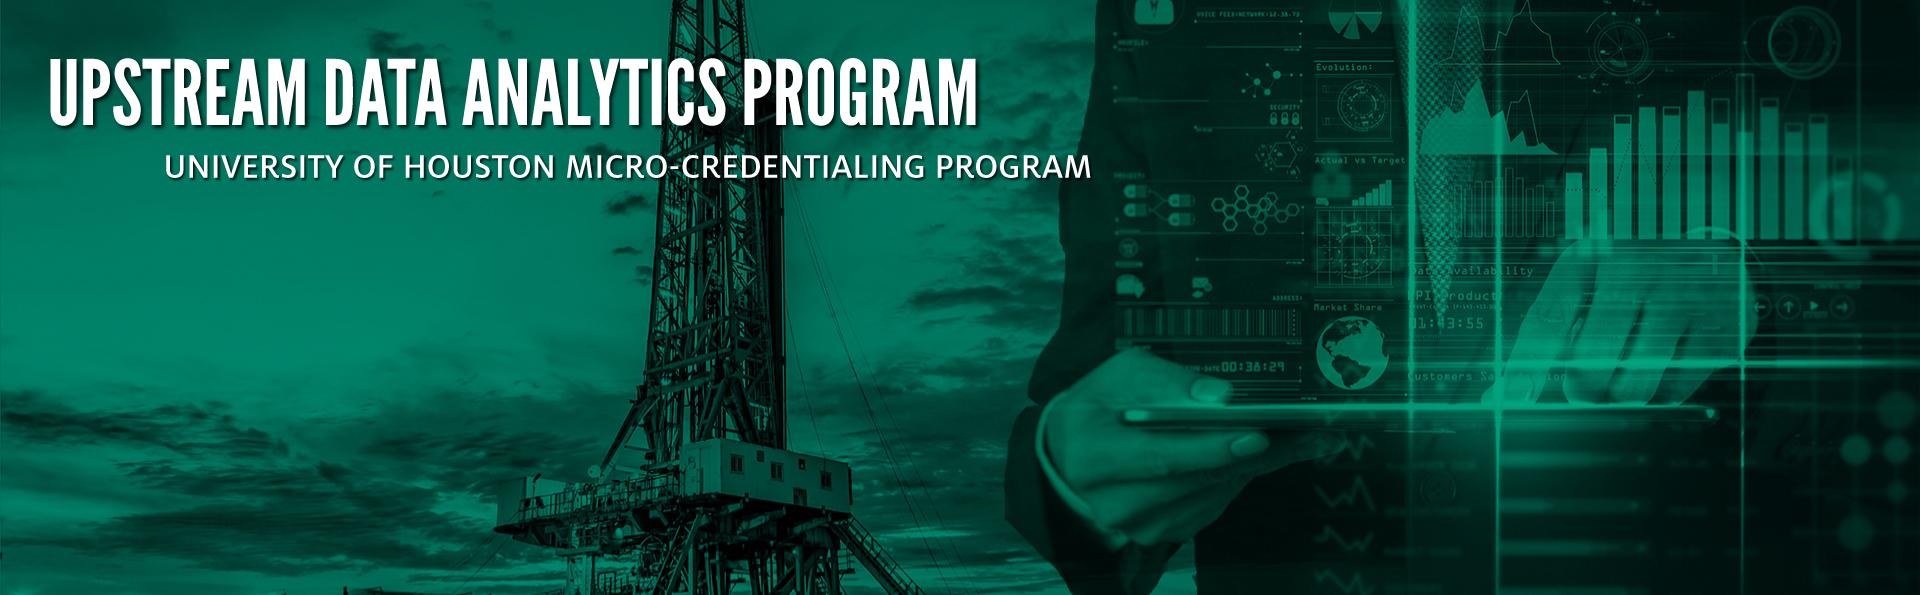 Upstream Energy Data Analytics Program Banner